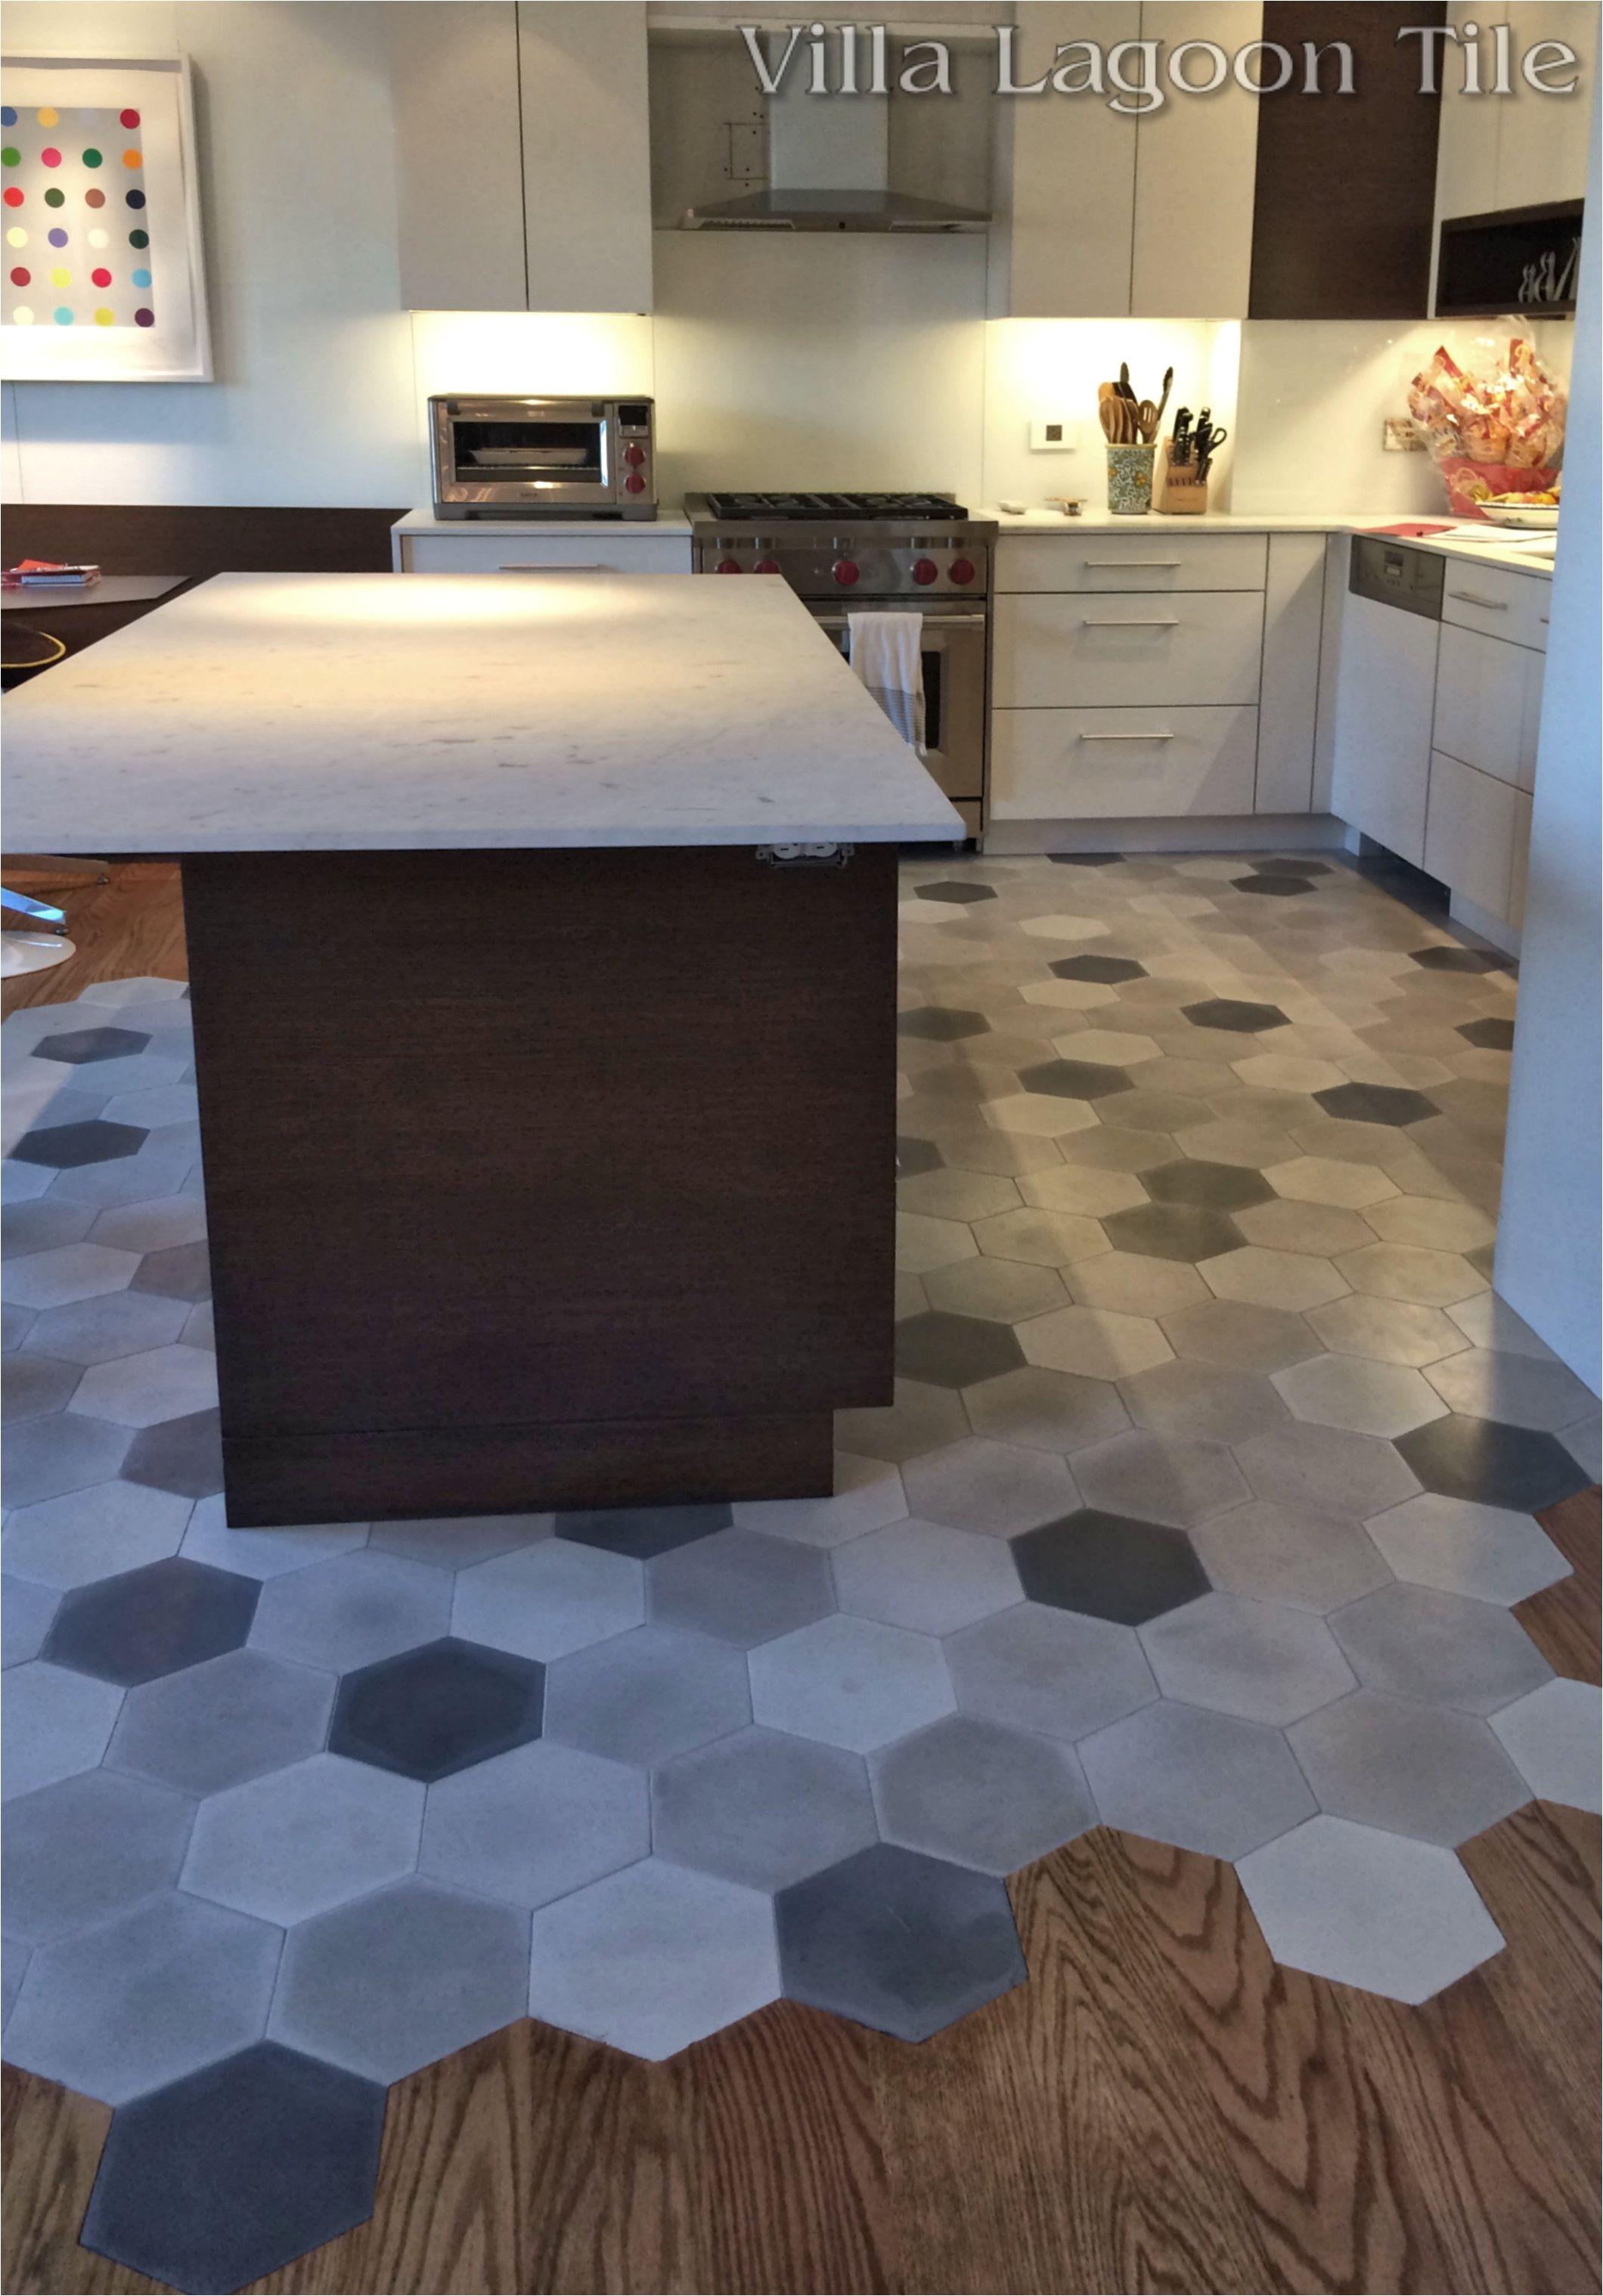 Marazzi American Heritage Spice Tile This Beautiful New York City Installation Flows Hardwood Floors Into